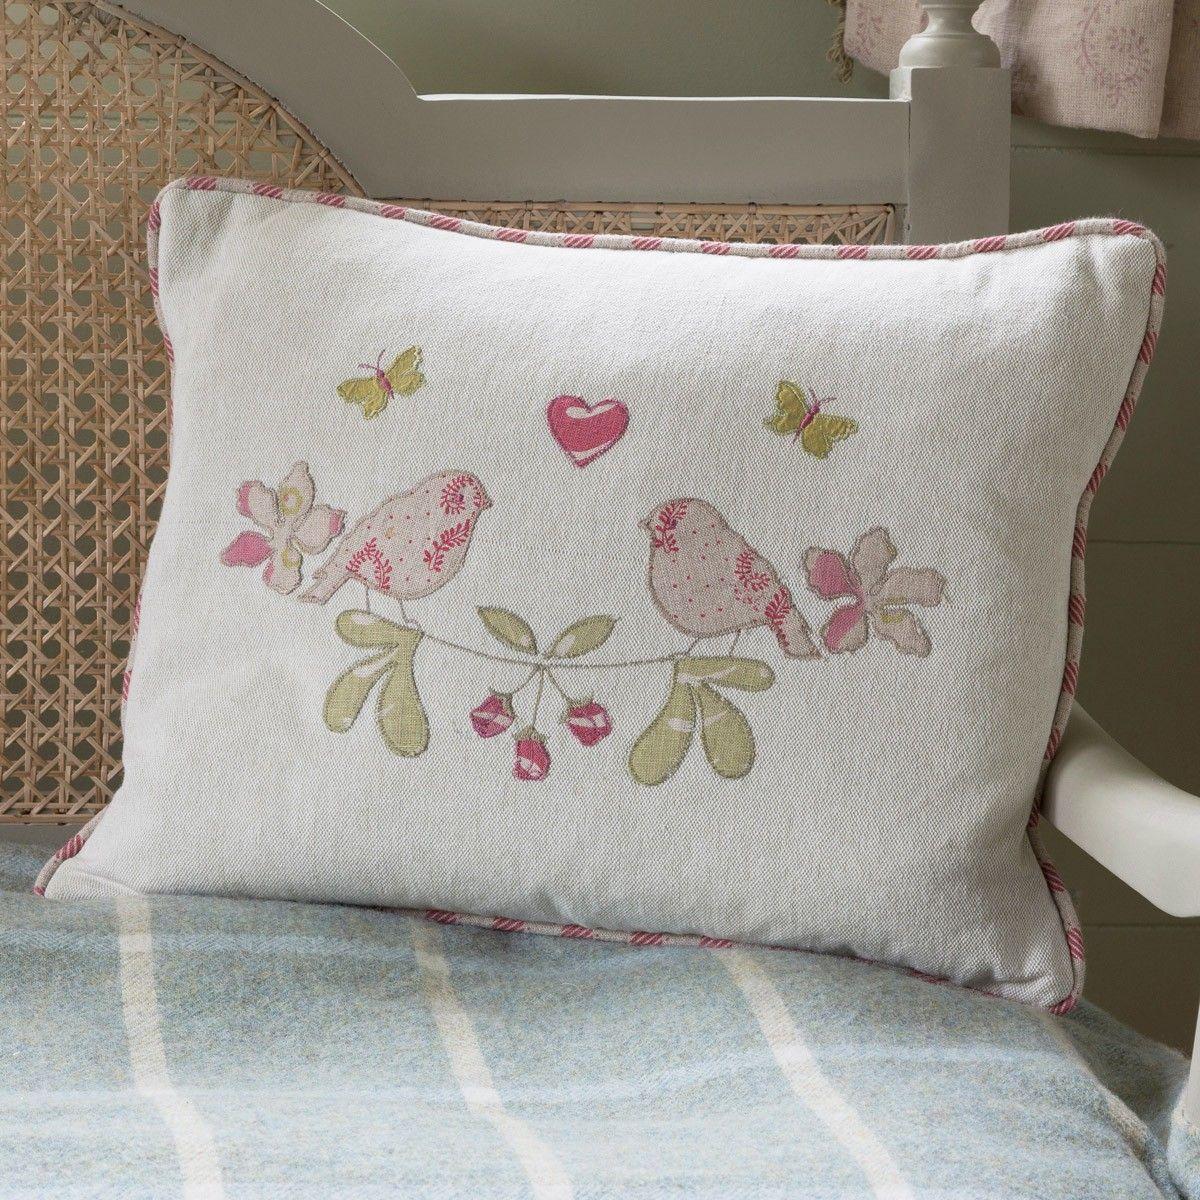 Pin by rachel waite on interiors pinterest cottage ideas living